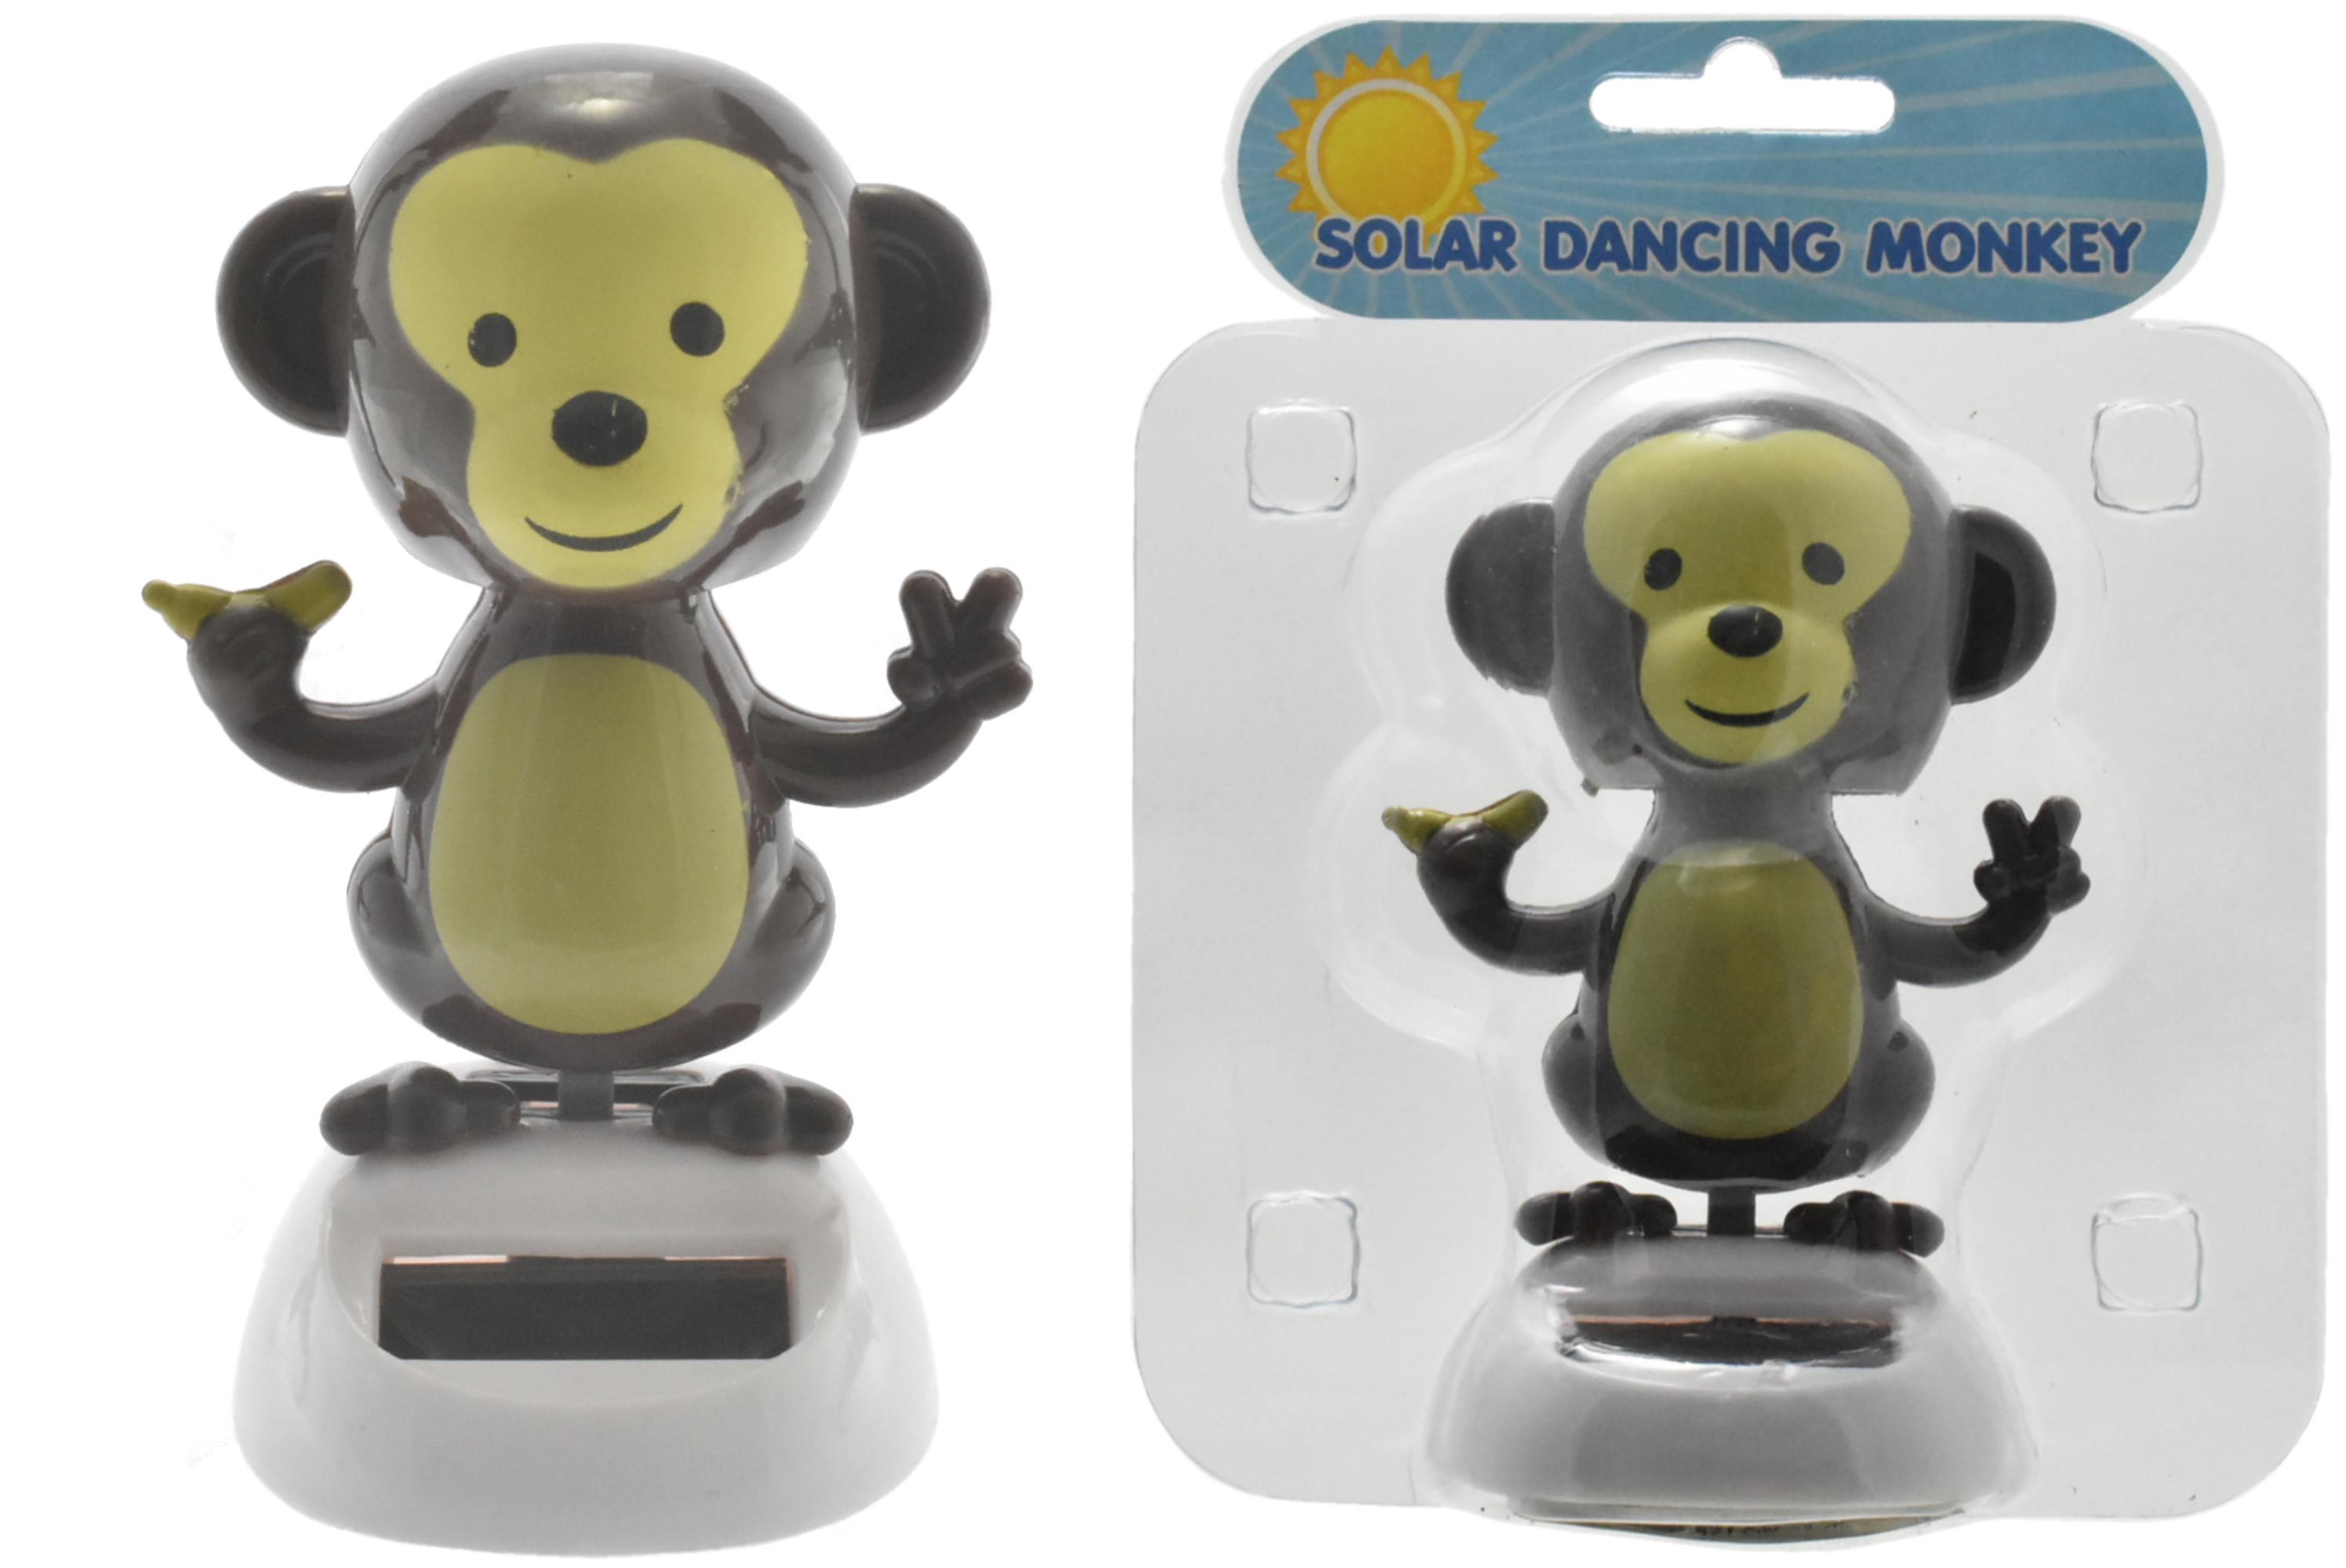 Solar Dancing Monkey In Clamshell